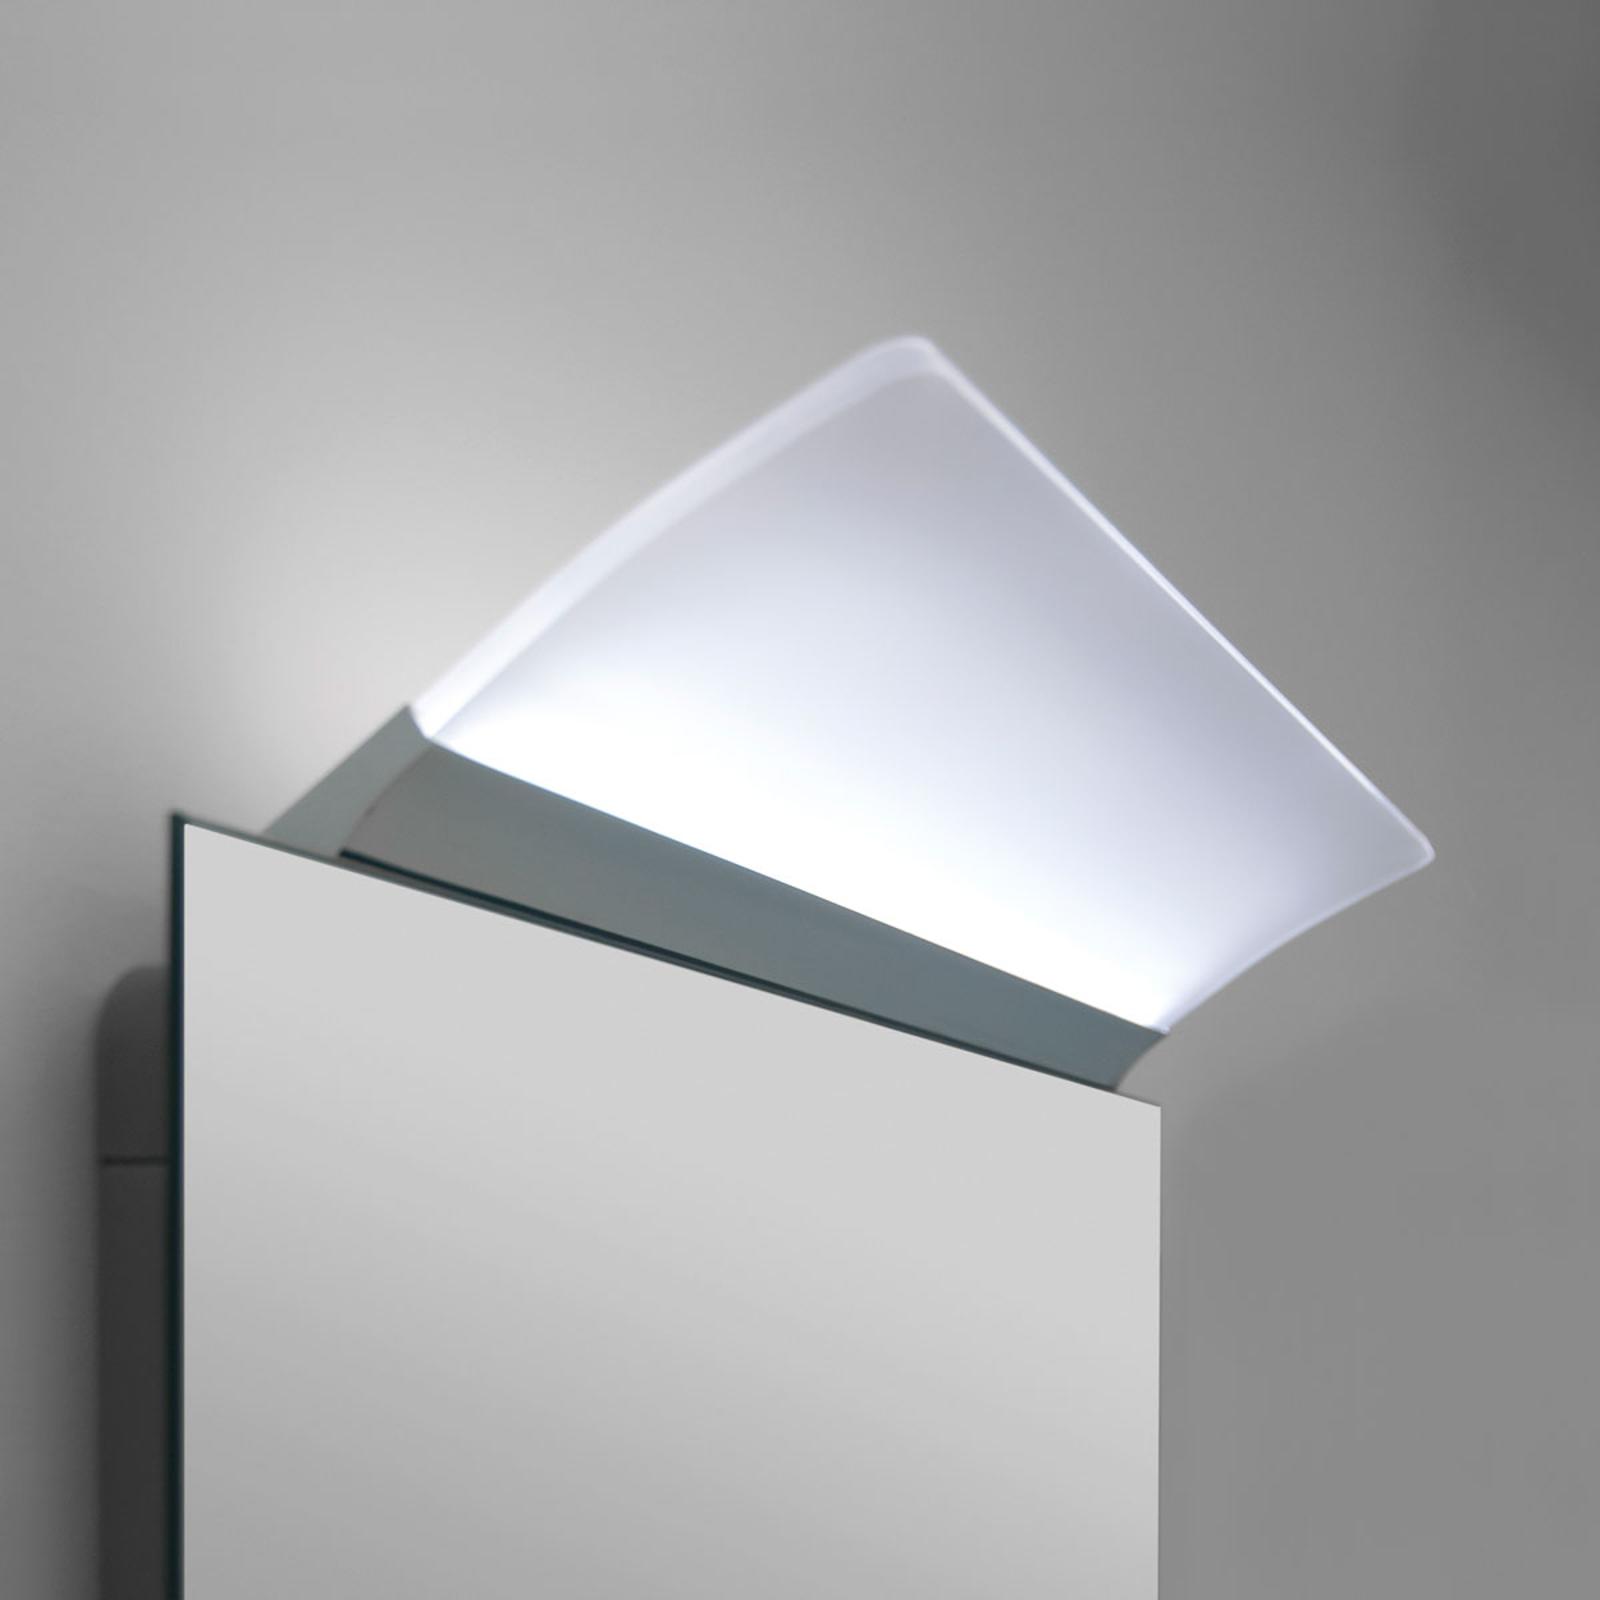 Luce per specchio a LED Angela, IP44, 30 cm